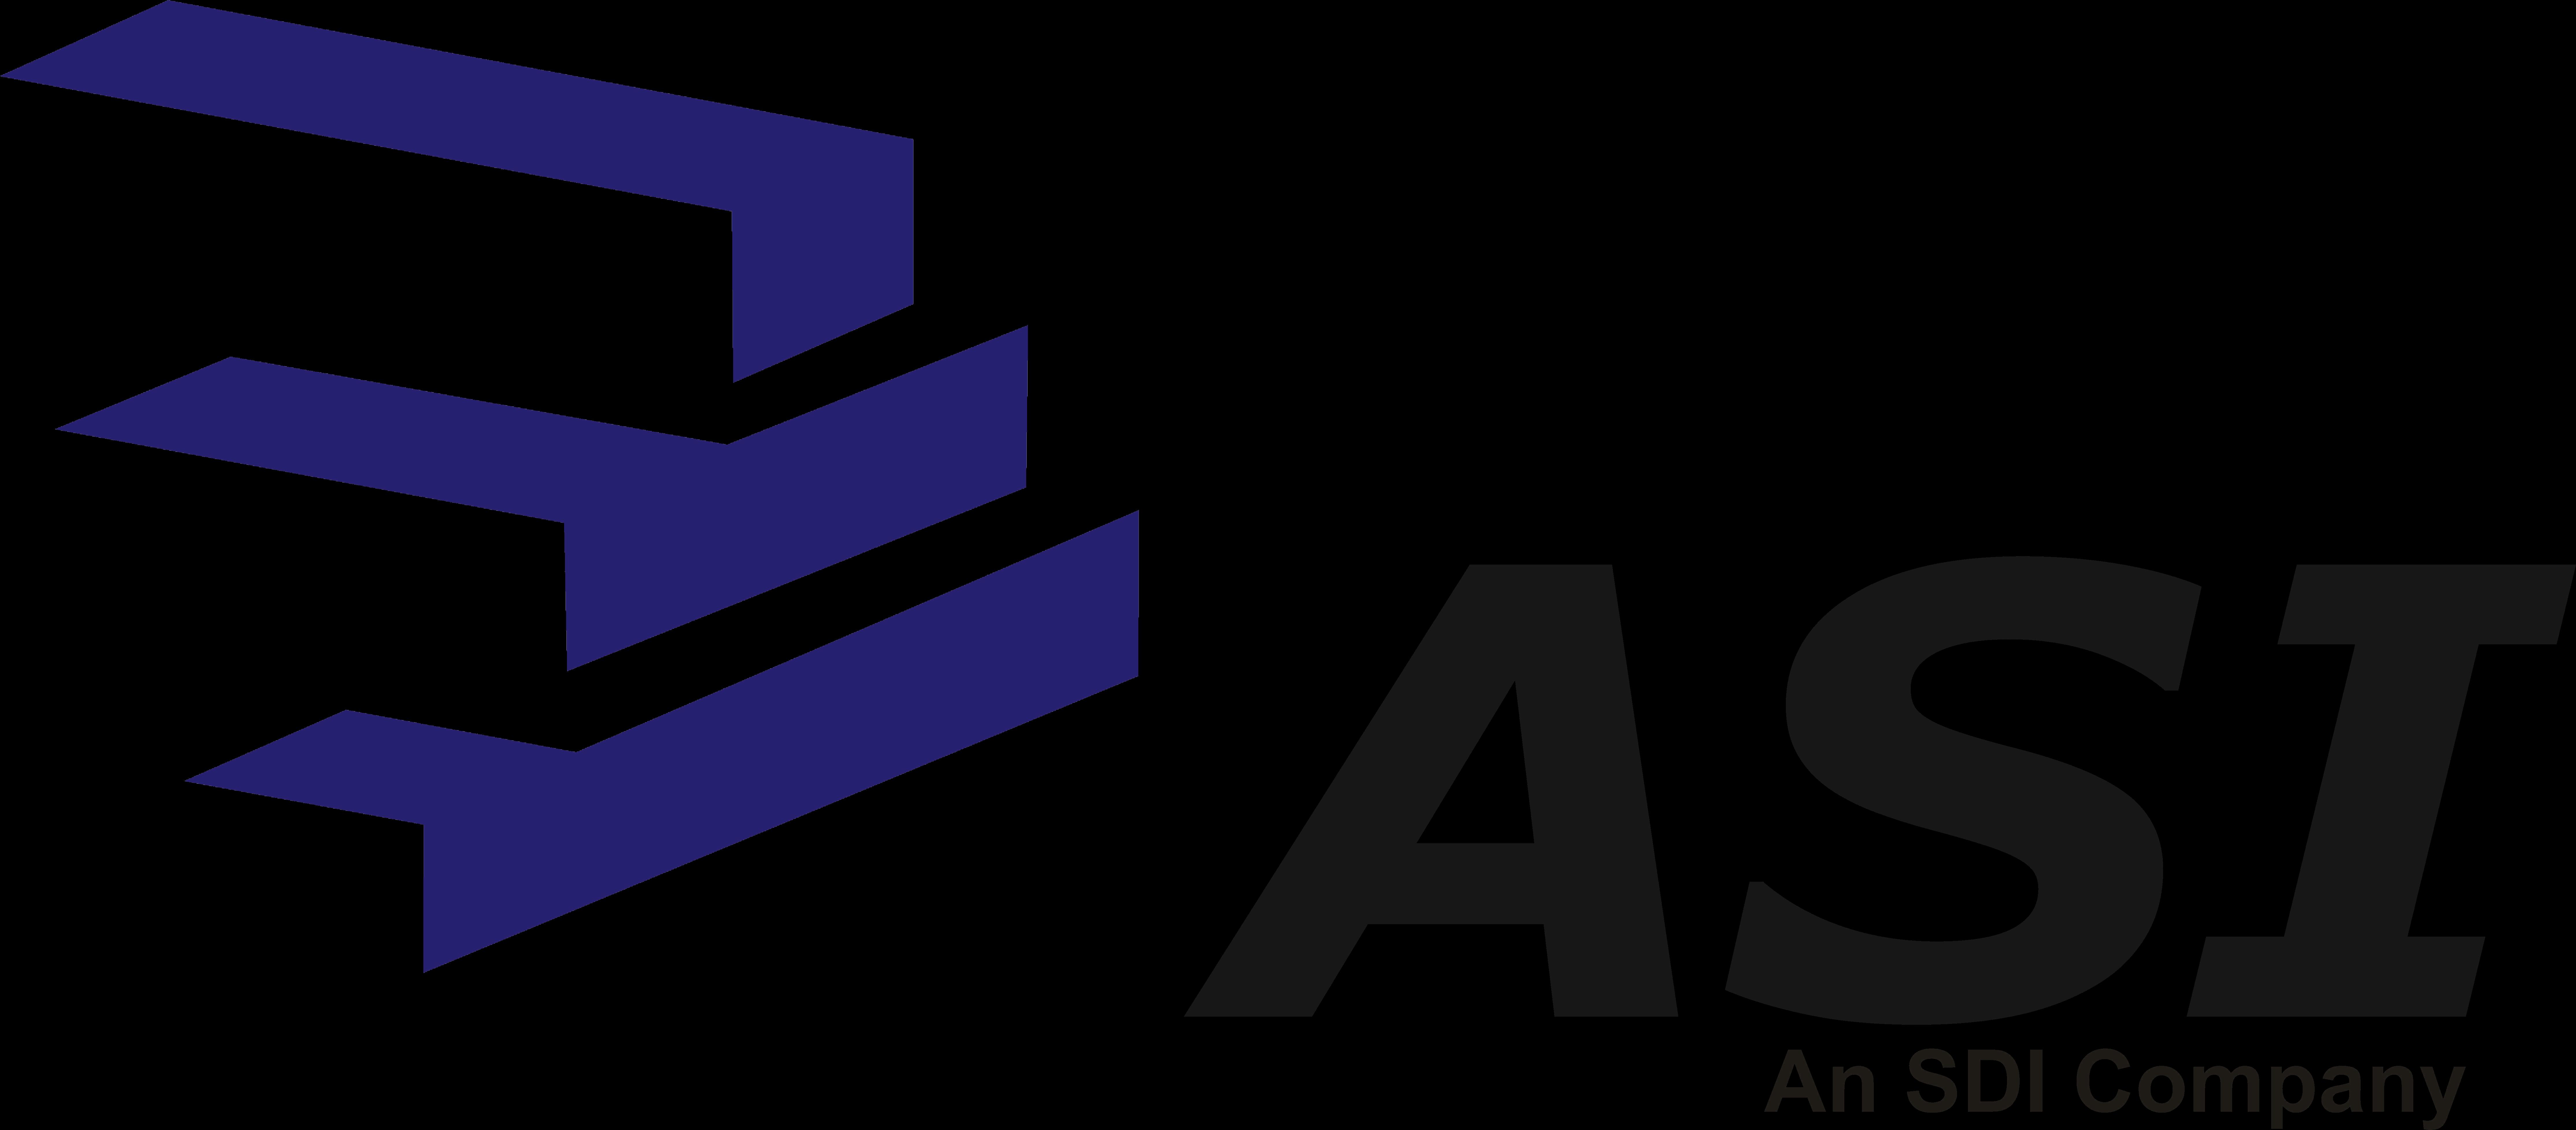 ASI Construction LLC